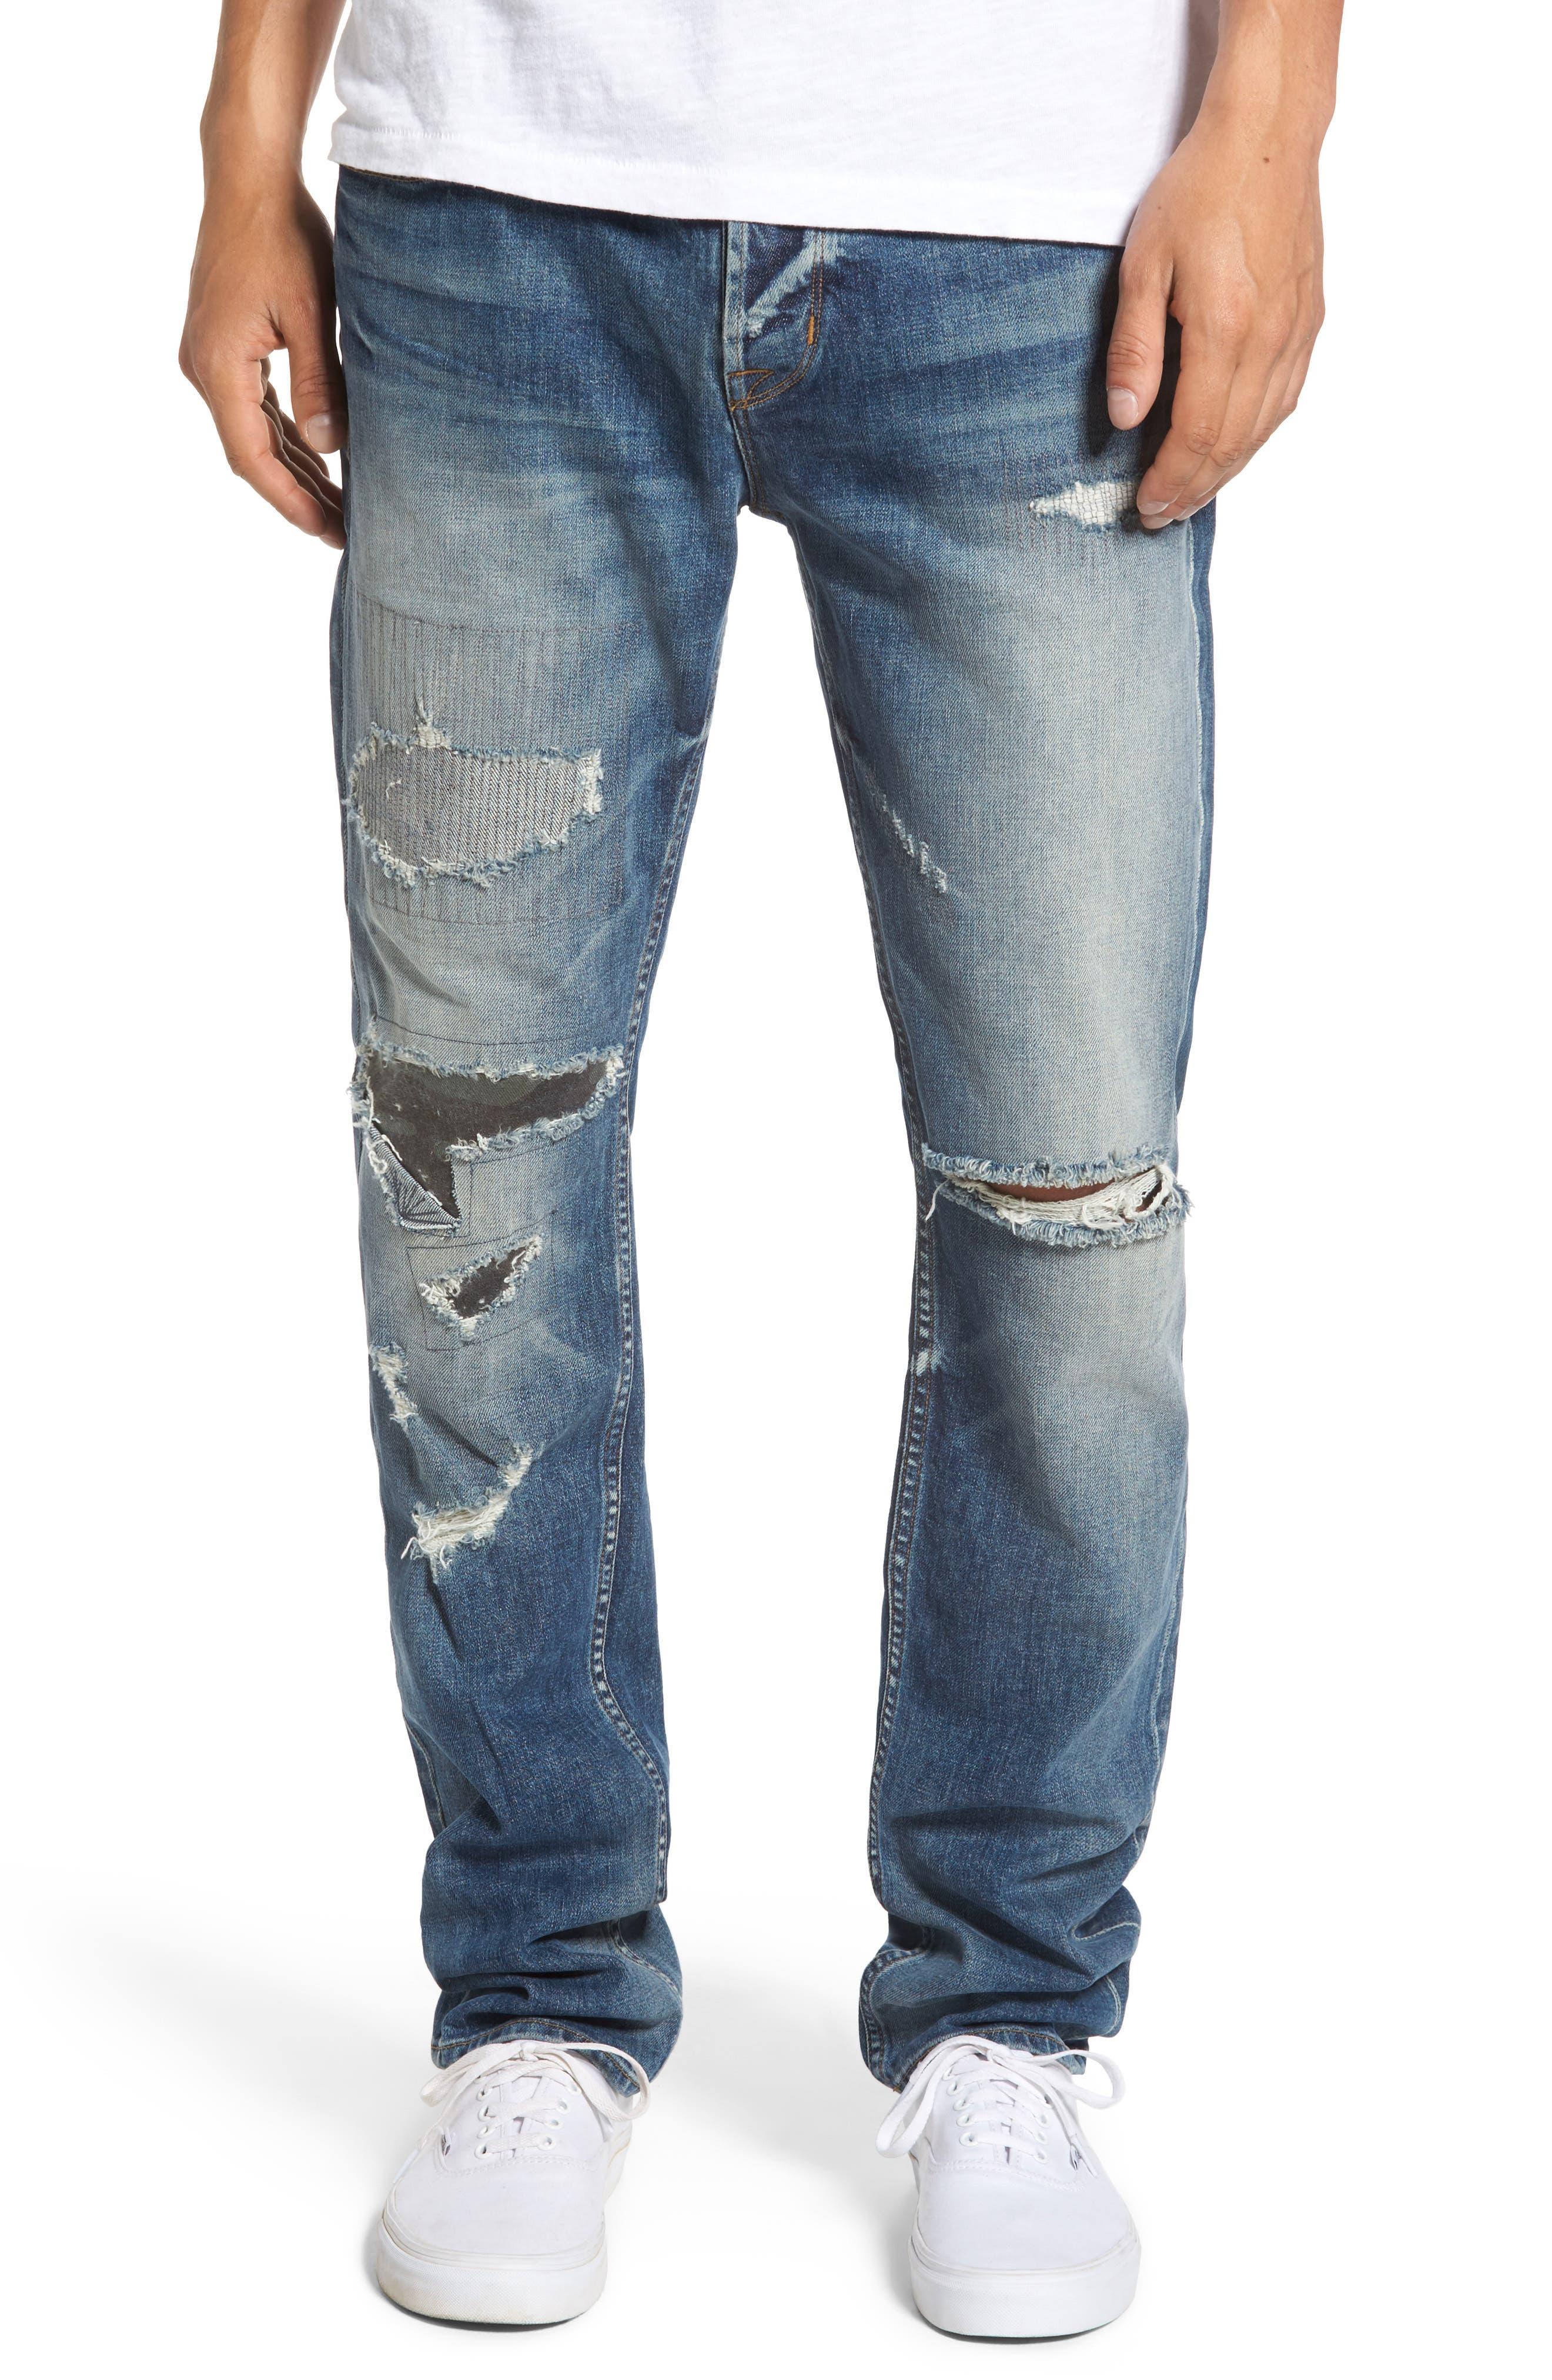 Sartor Slouchy Skinny Jeans,                             Main thumbnail 1, color,                             421